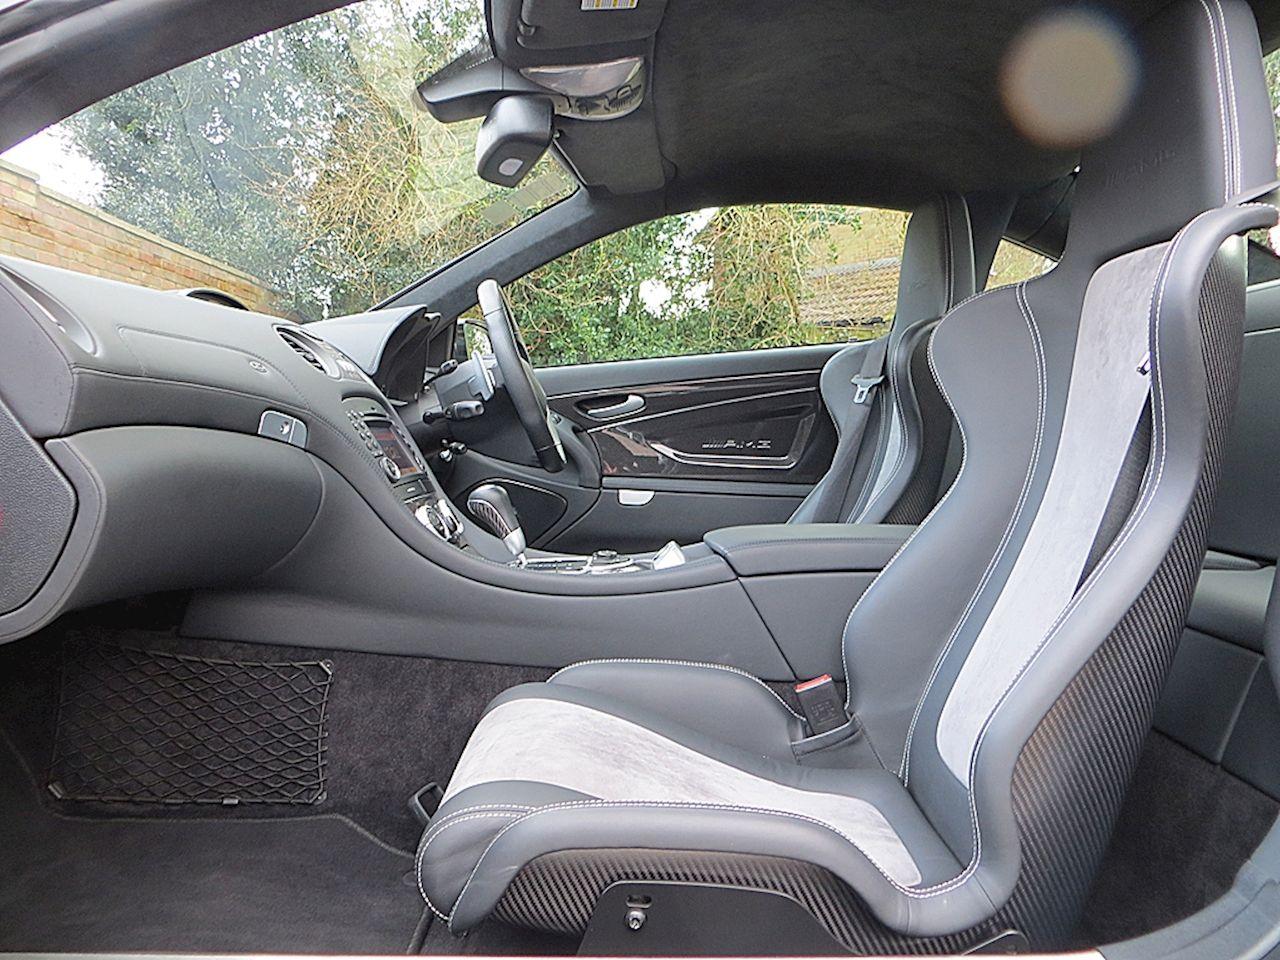 2010 Used MercedesBenz Sl Sl65 Amg Black Series (With